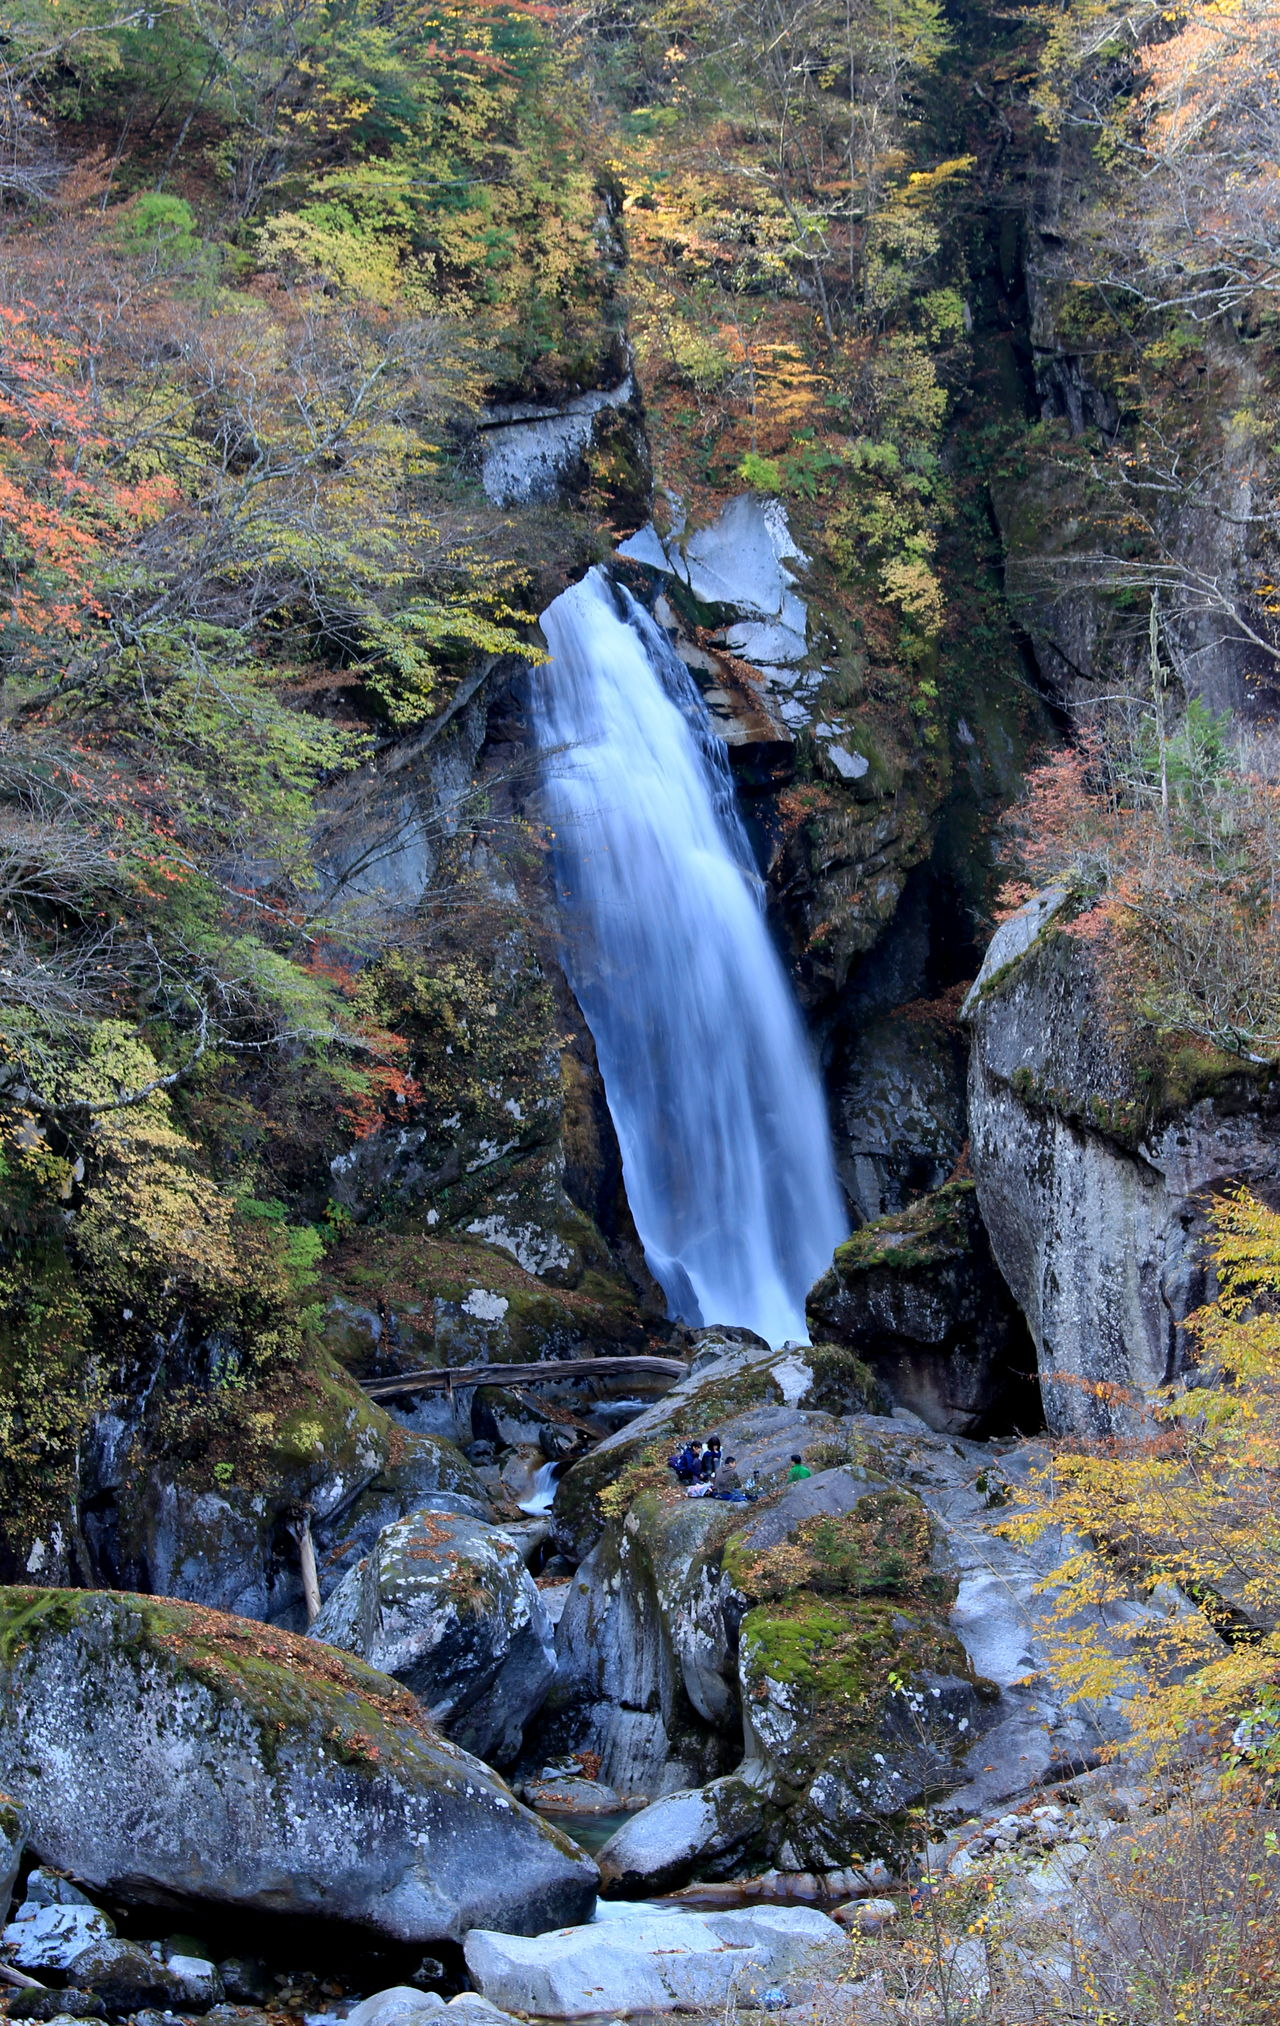 Huge Mountain Nature Ojiro Water Waterfall Yamanashi ハイキング 不動滝 尾白川渓谷 山 滝 自然